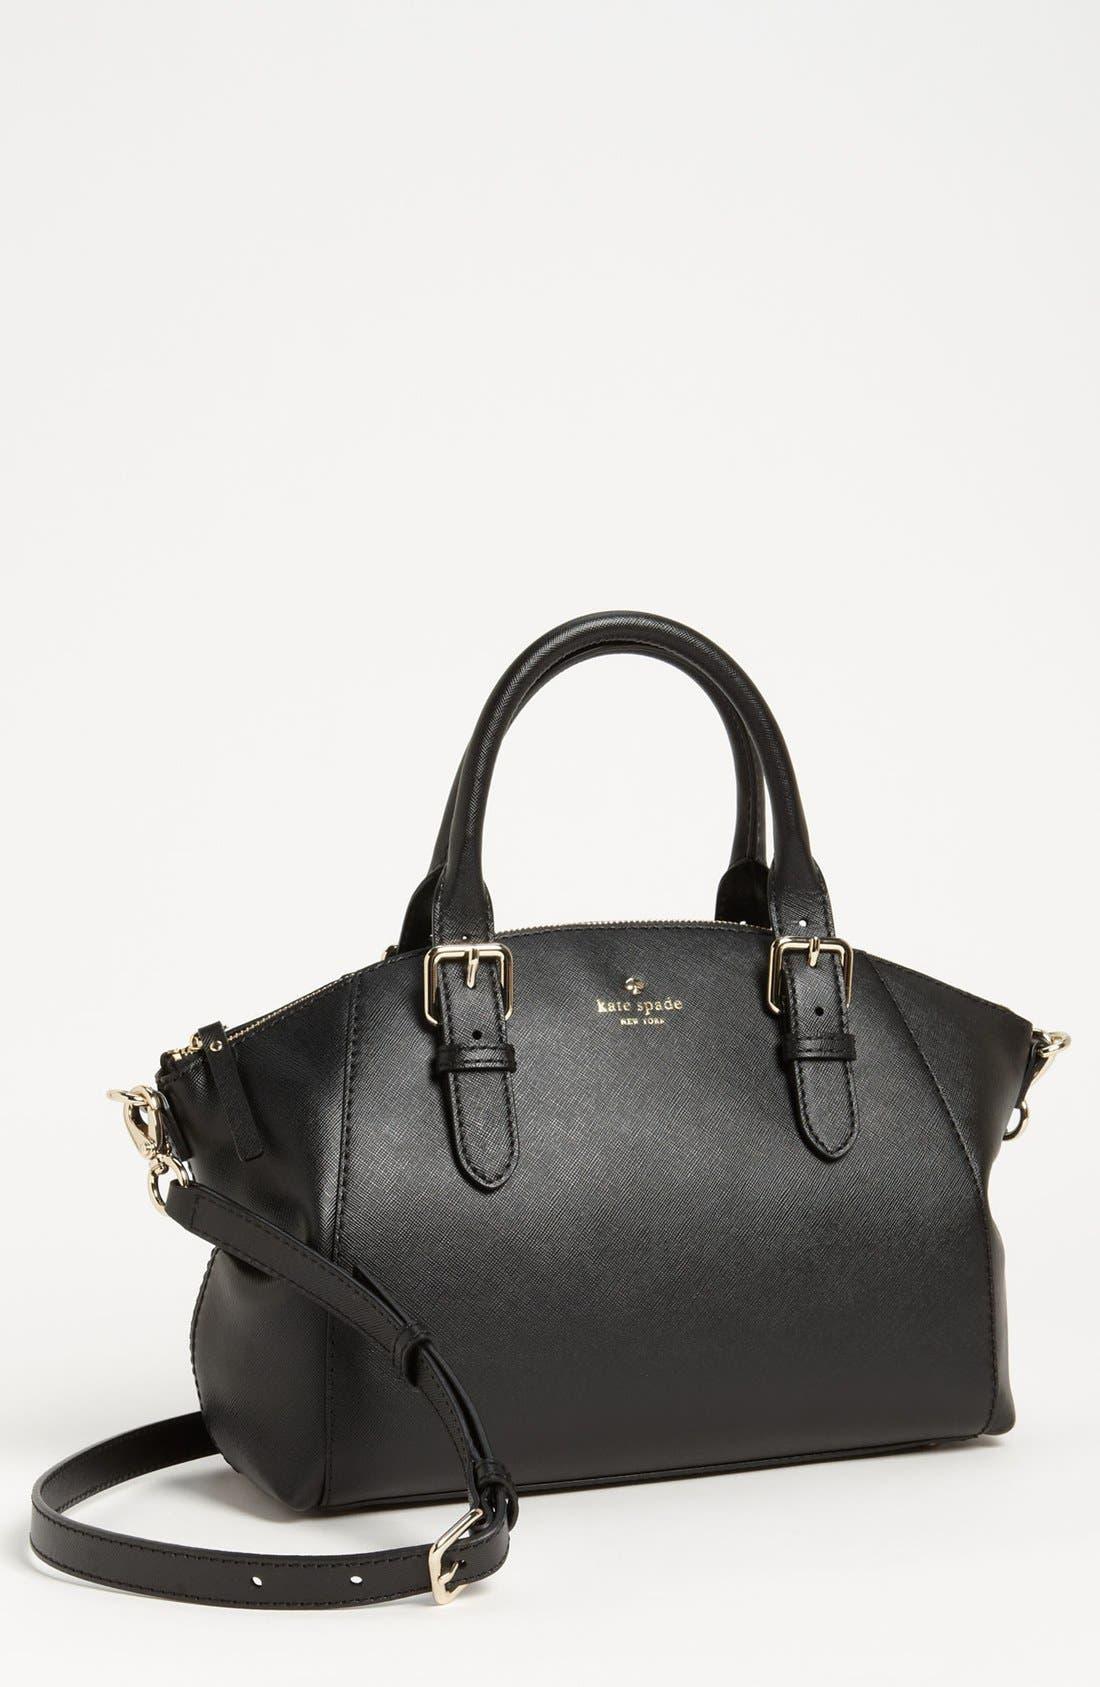 Main Image - kate spade new york 'charlotte street - small sloan' satchel